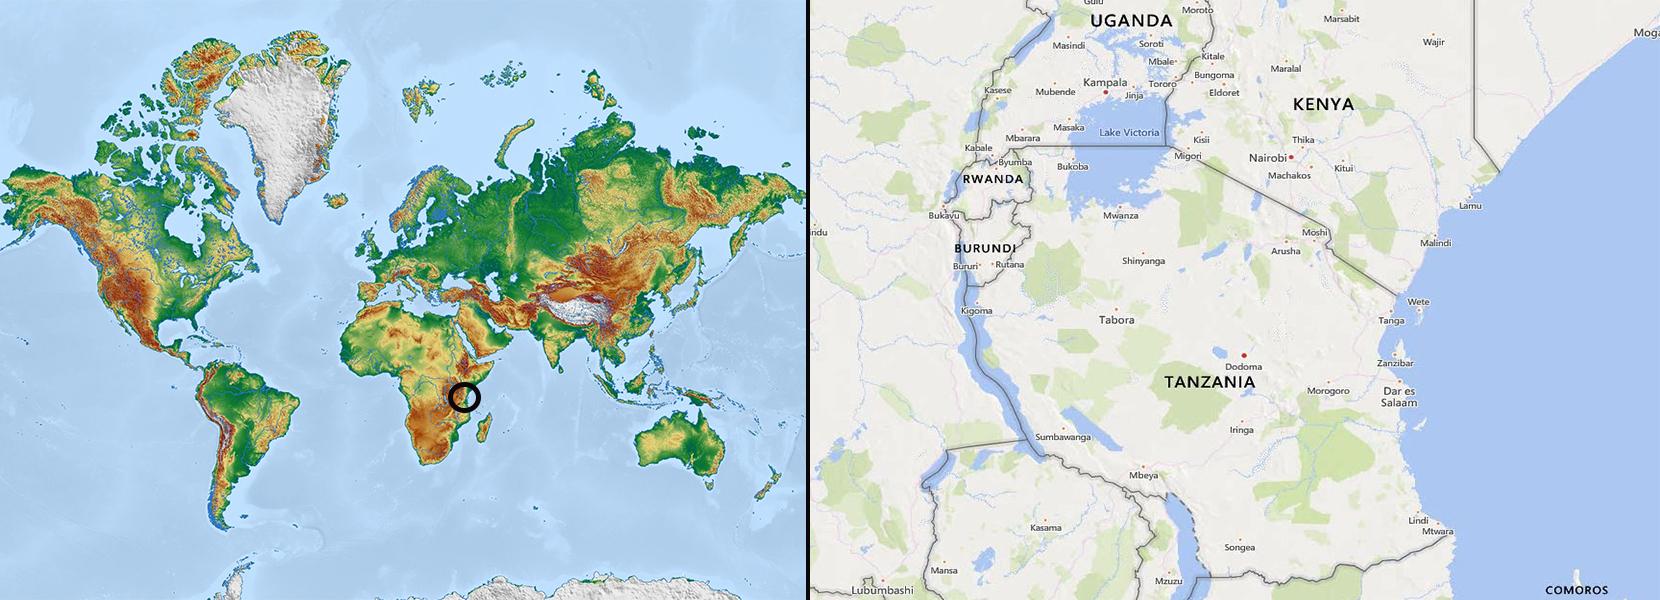 Mapa Tanzania-R4W